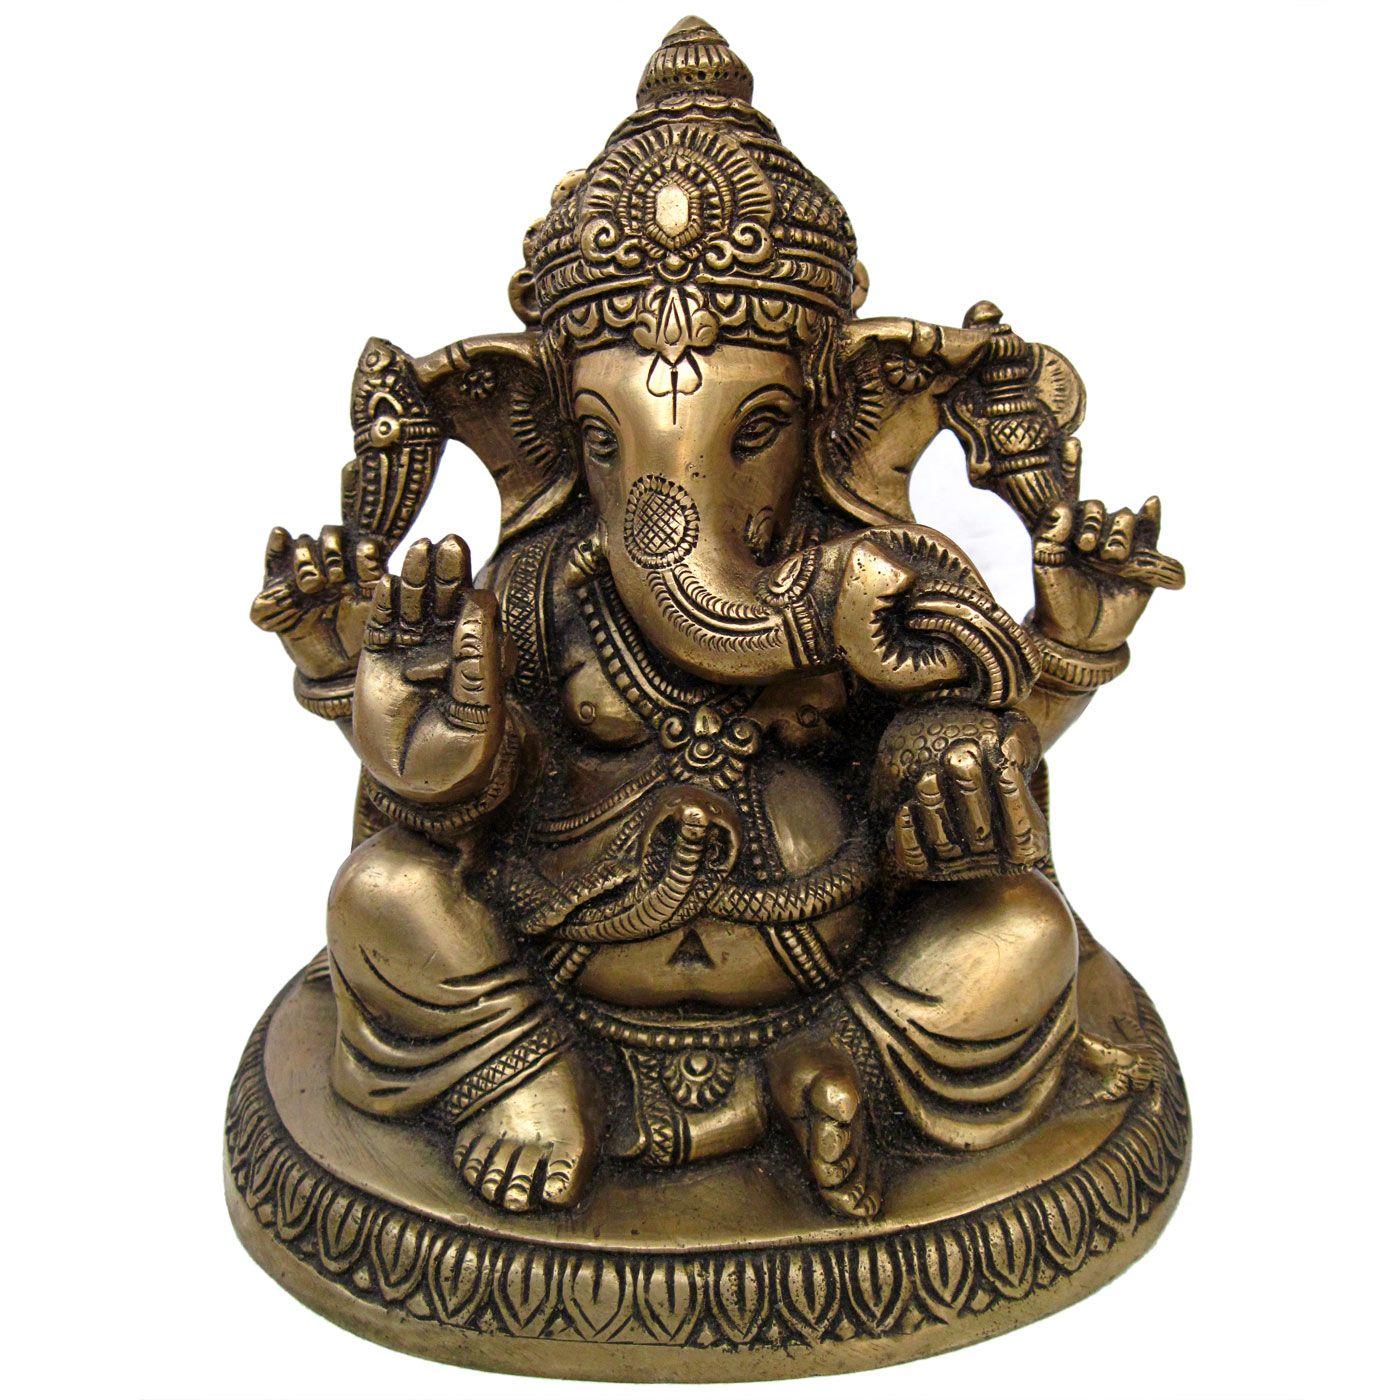 brass ganesh statue lord ganesh statue brass statues brass ganesh statue lord ganesh statue